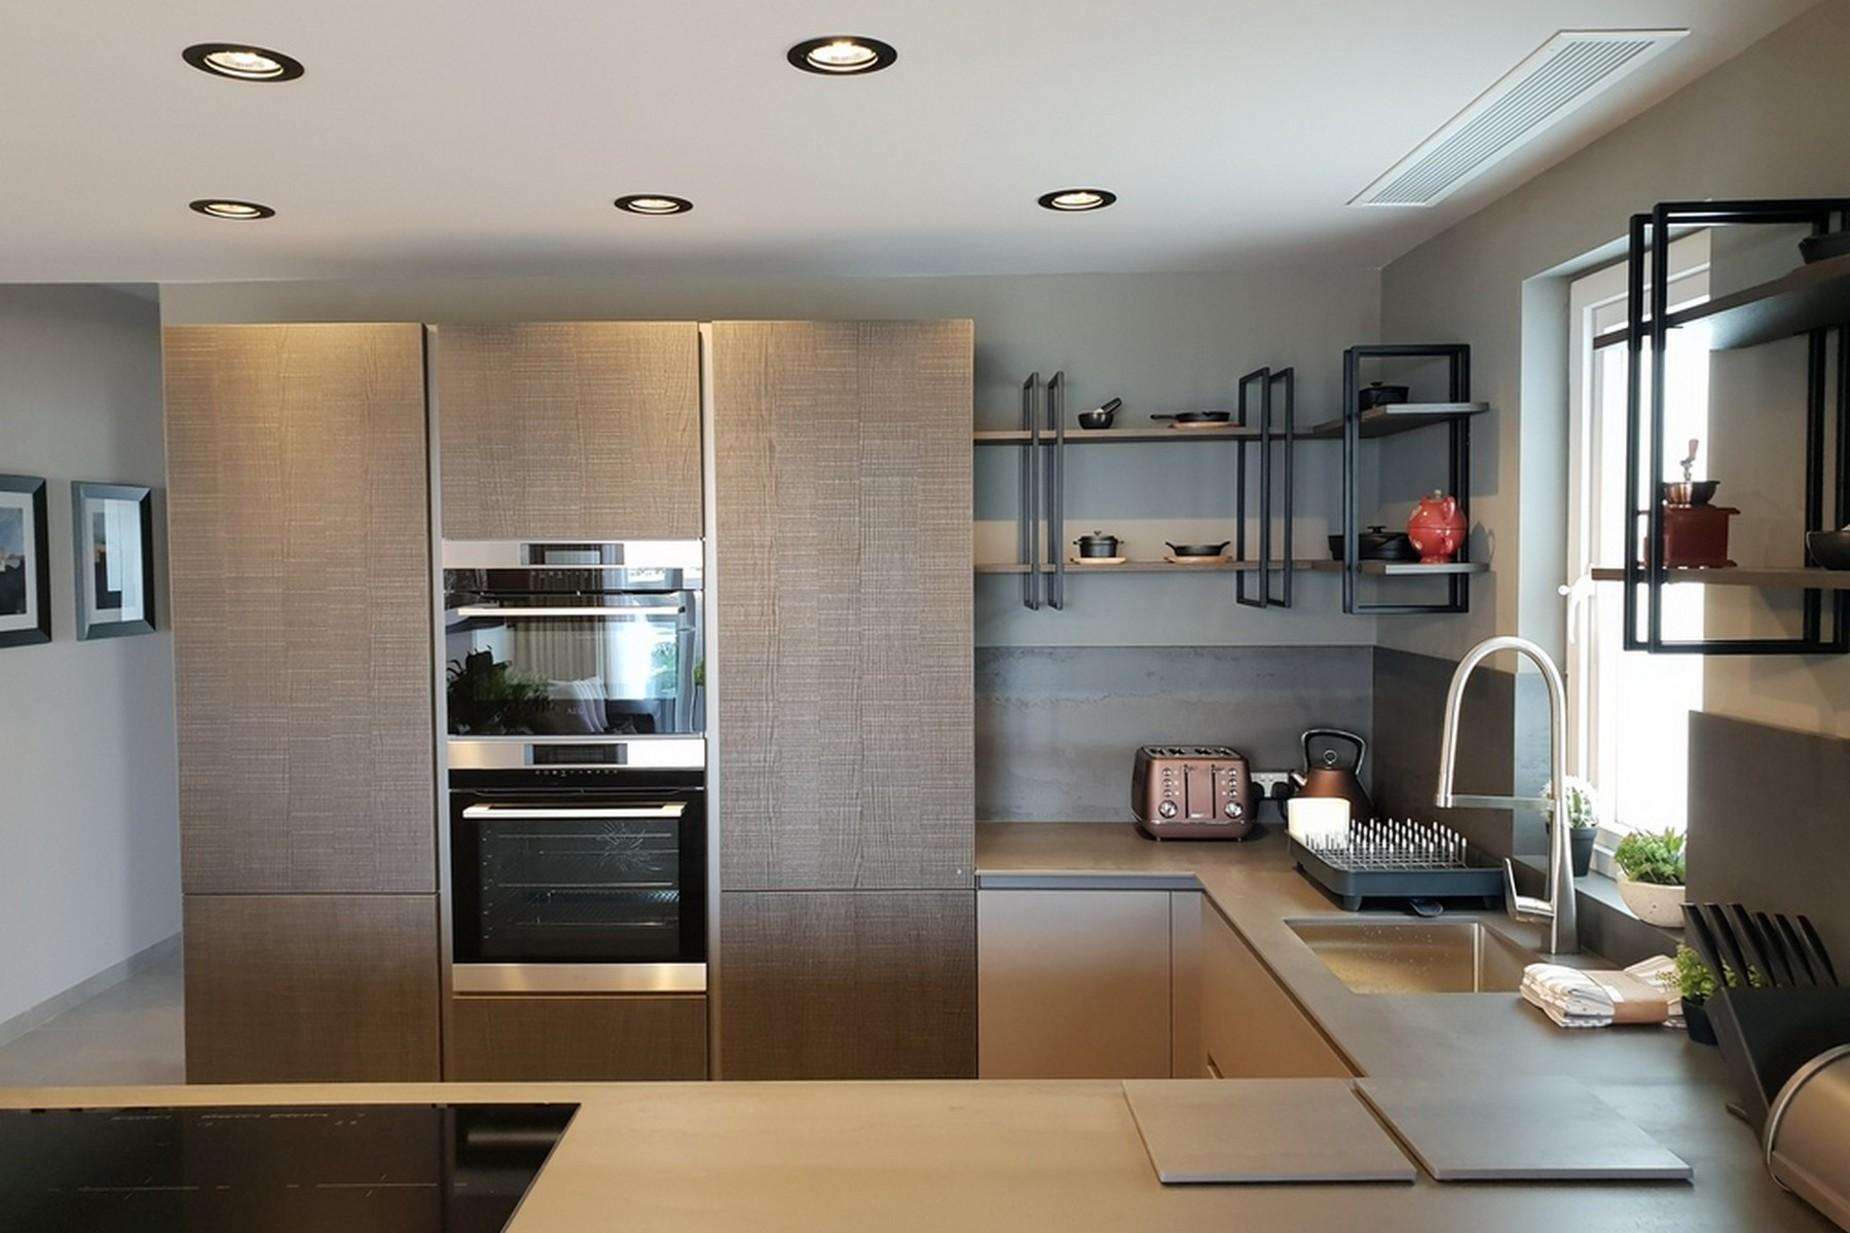 2 bed Apartment For Rent in Birkirkara, Birkirkara - thumb 4